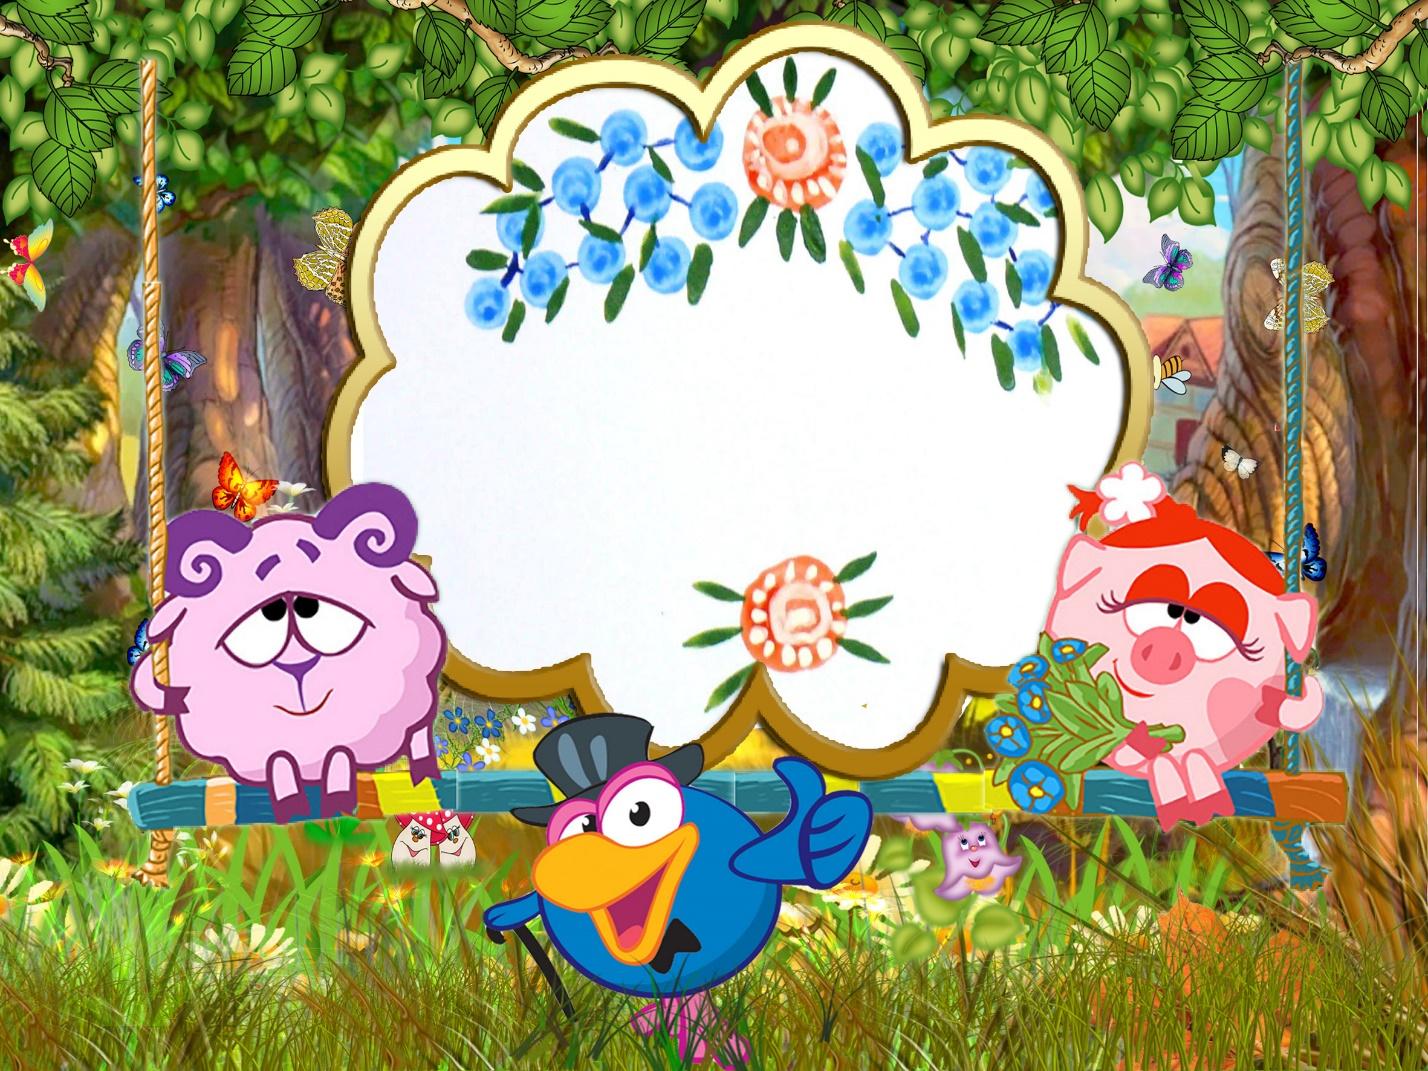 Детский сад группа смешарики картинки